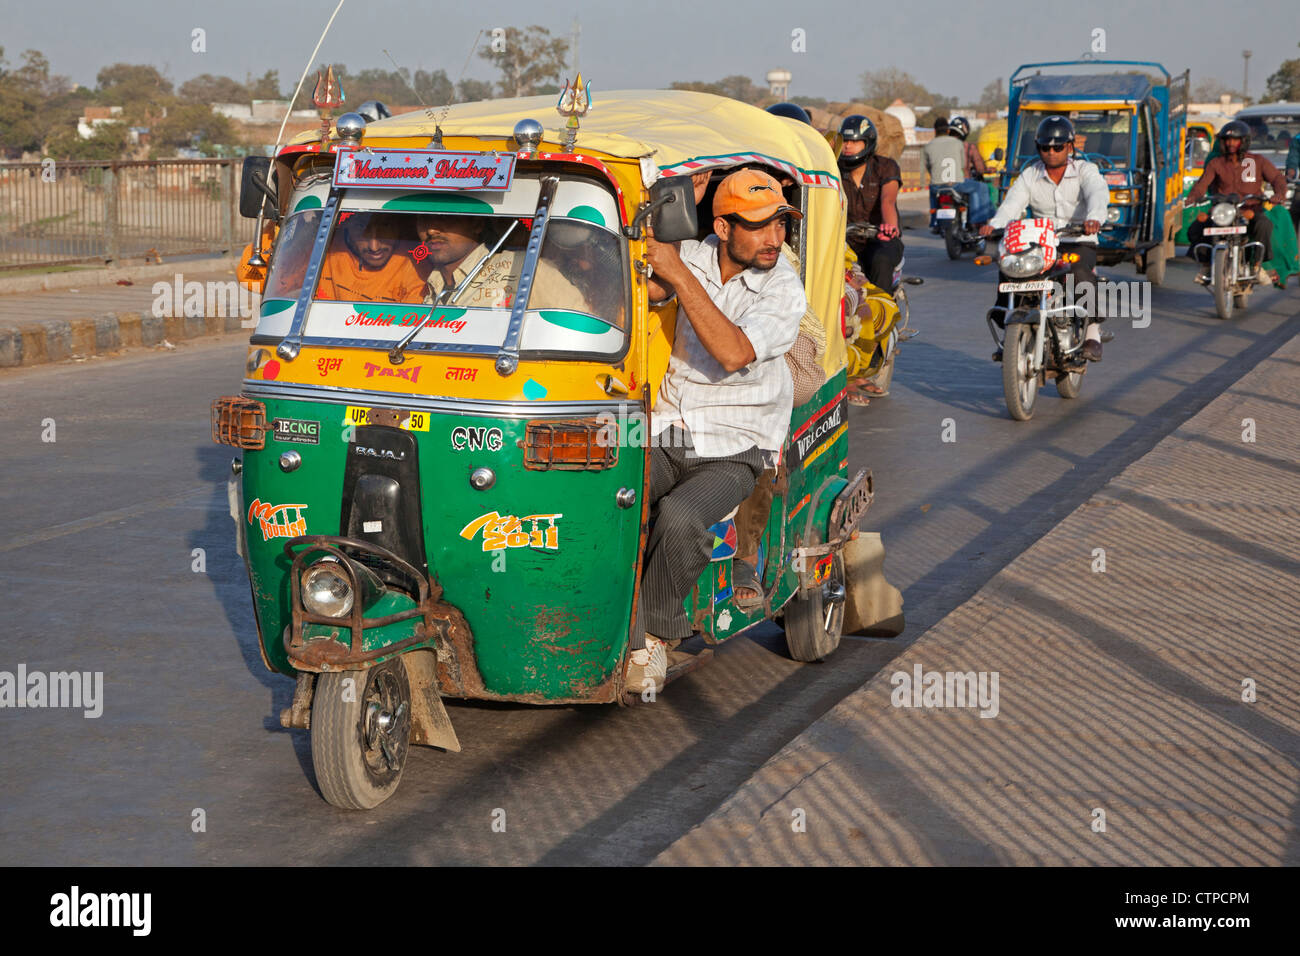 Fully loaded autorickshaw, three-wheeled motorized taxi in busy traffic at Agra, Uttar Pradesh, India - Stock Image